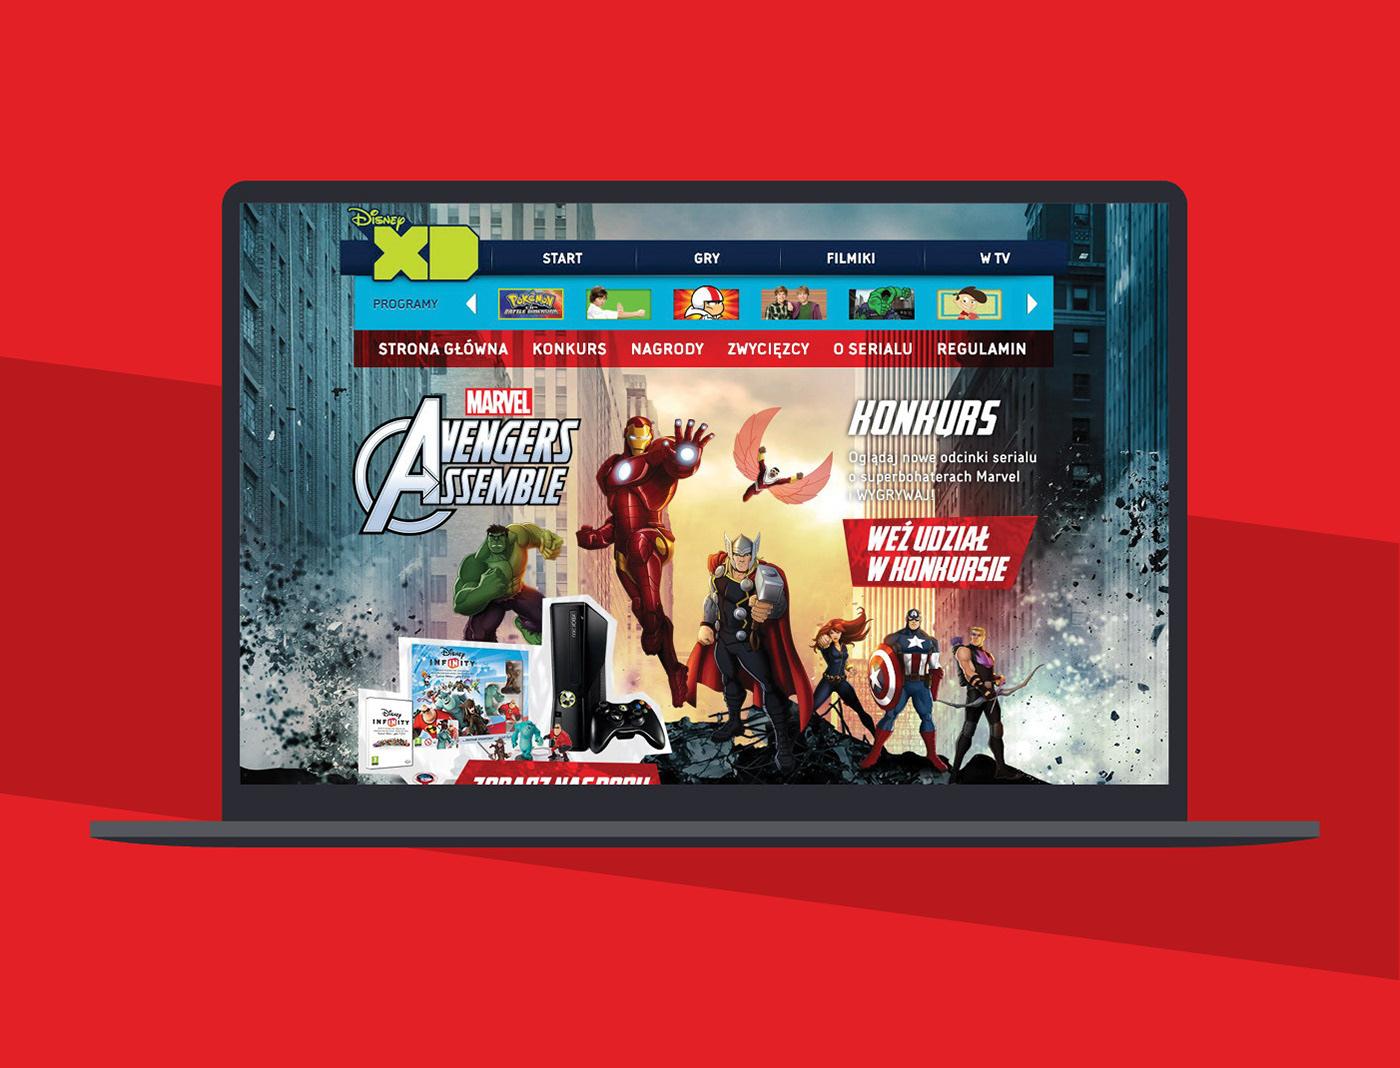 The Walt Disney Company konkurs Avengers Assemble